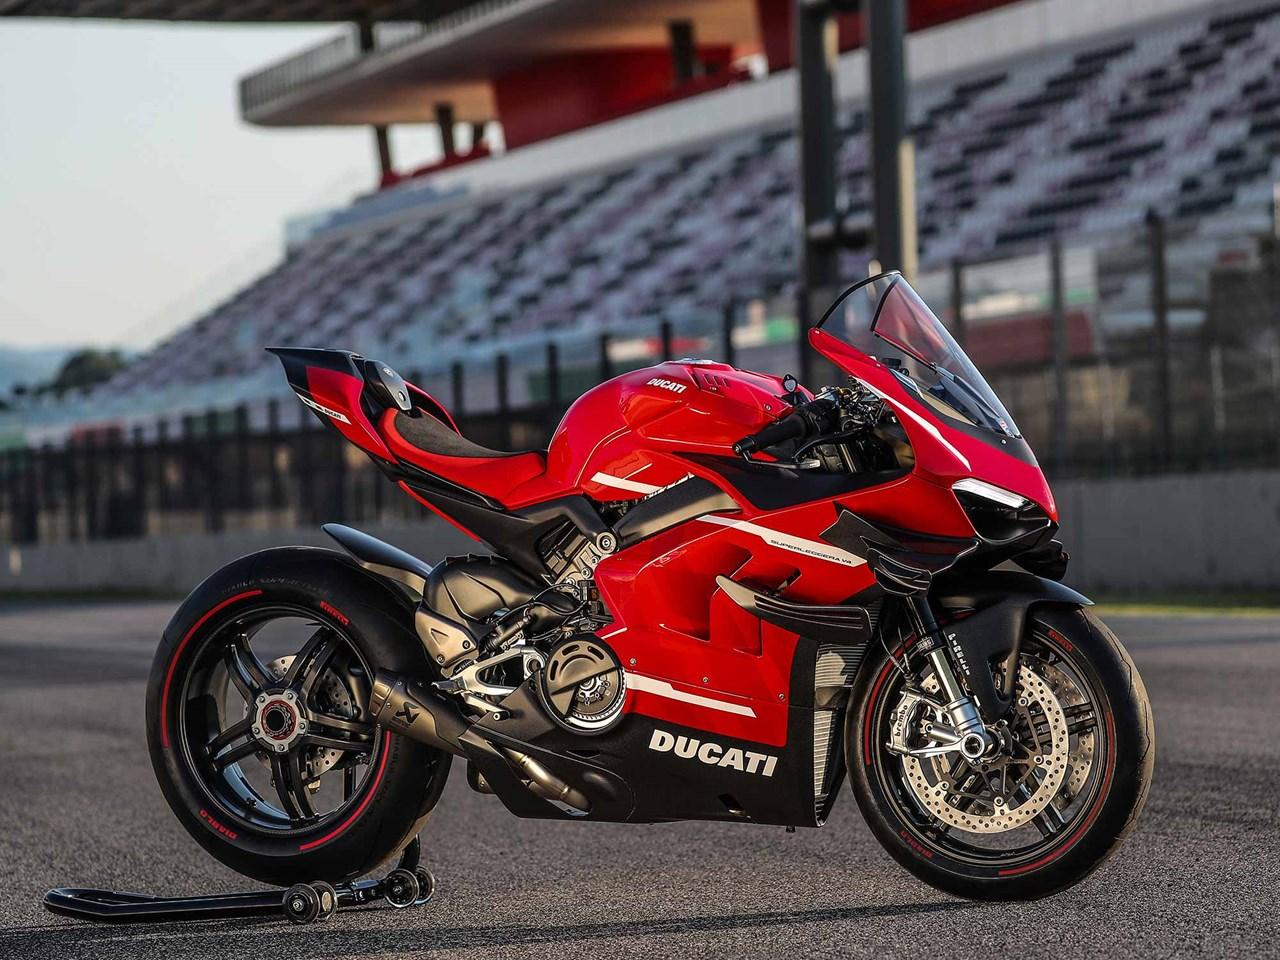 Ducati Superleggera V4 2020 On Review Mcn